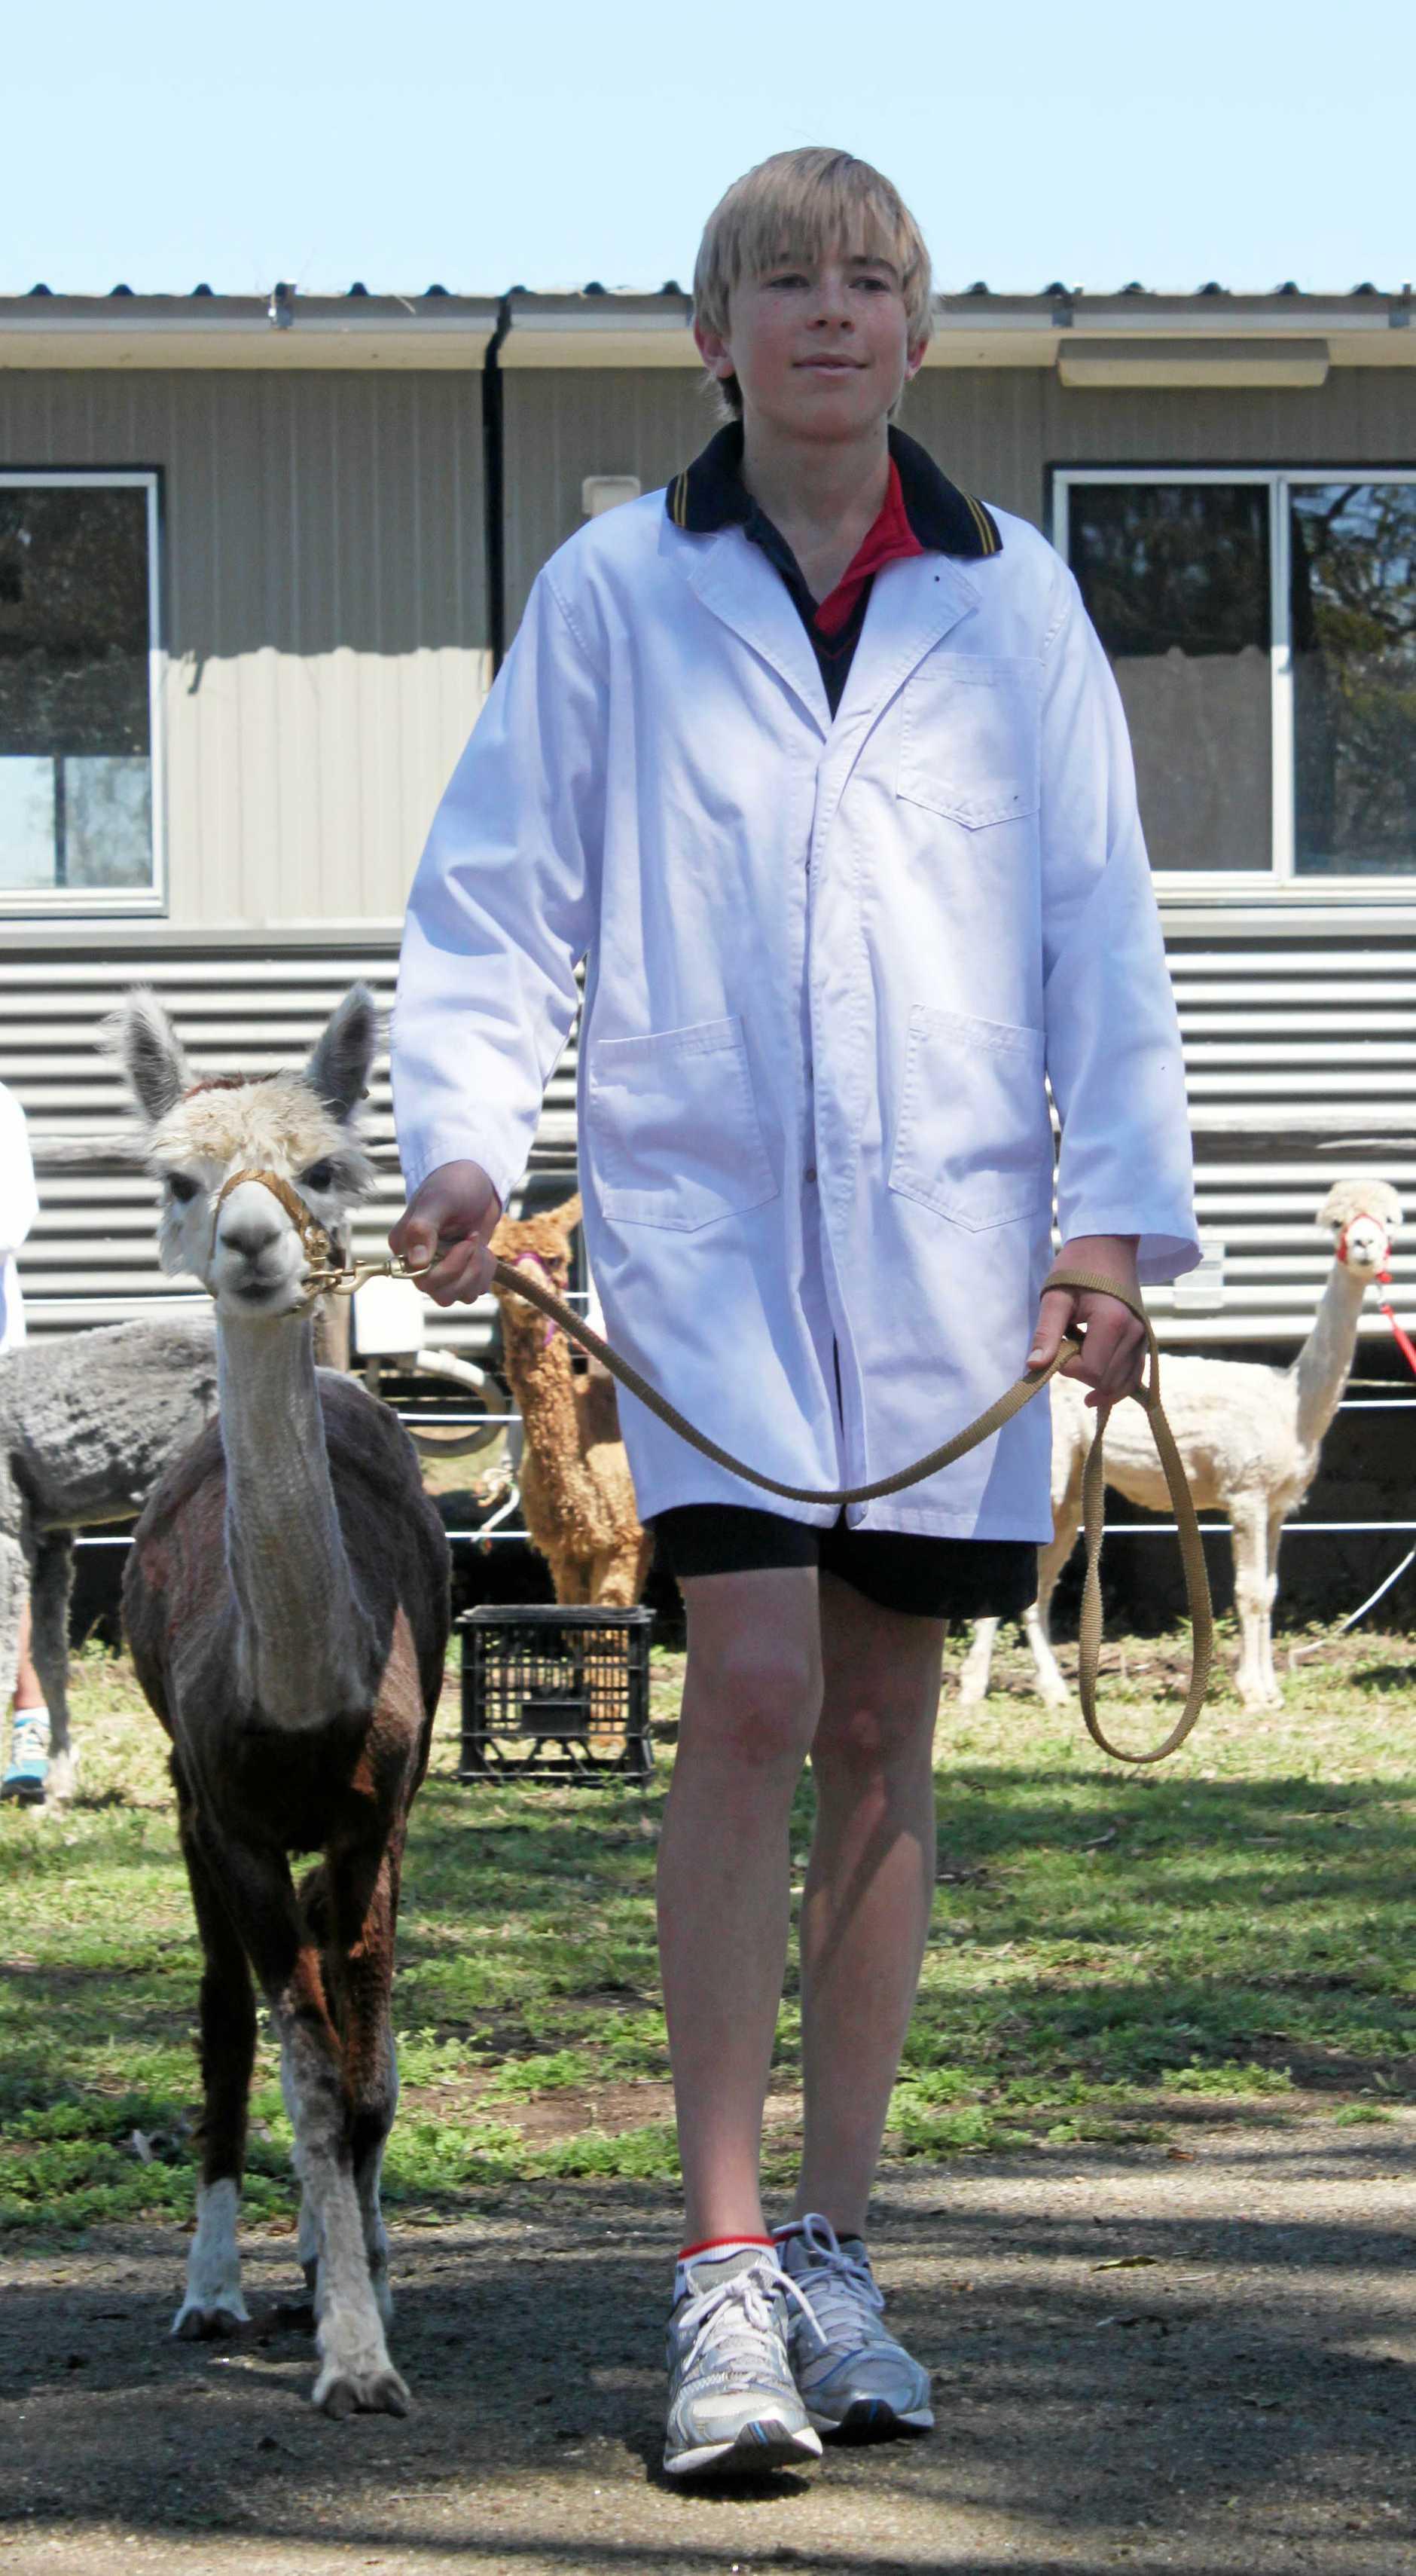 George Bird leads an alpaca through its paces at the Rockhampton Grammar School - Alpaca Junior Handlers Competition. Photo THE MORNING BULLETIN Kathryn Greensill RRW290811kalpaca8